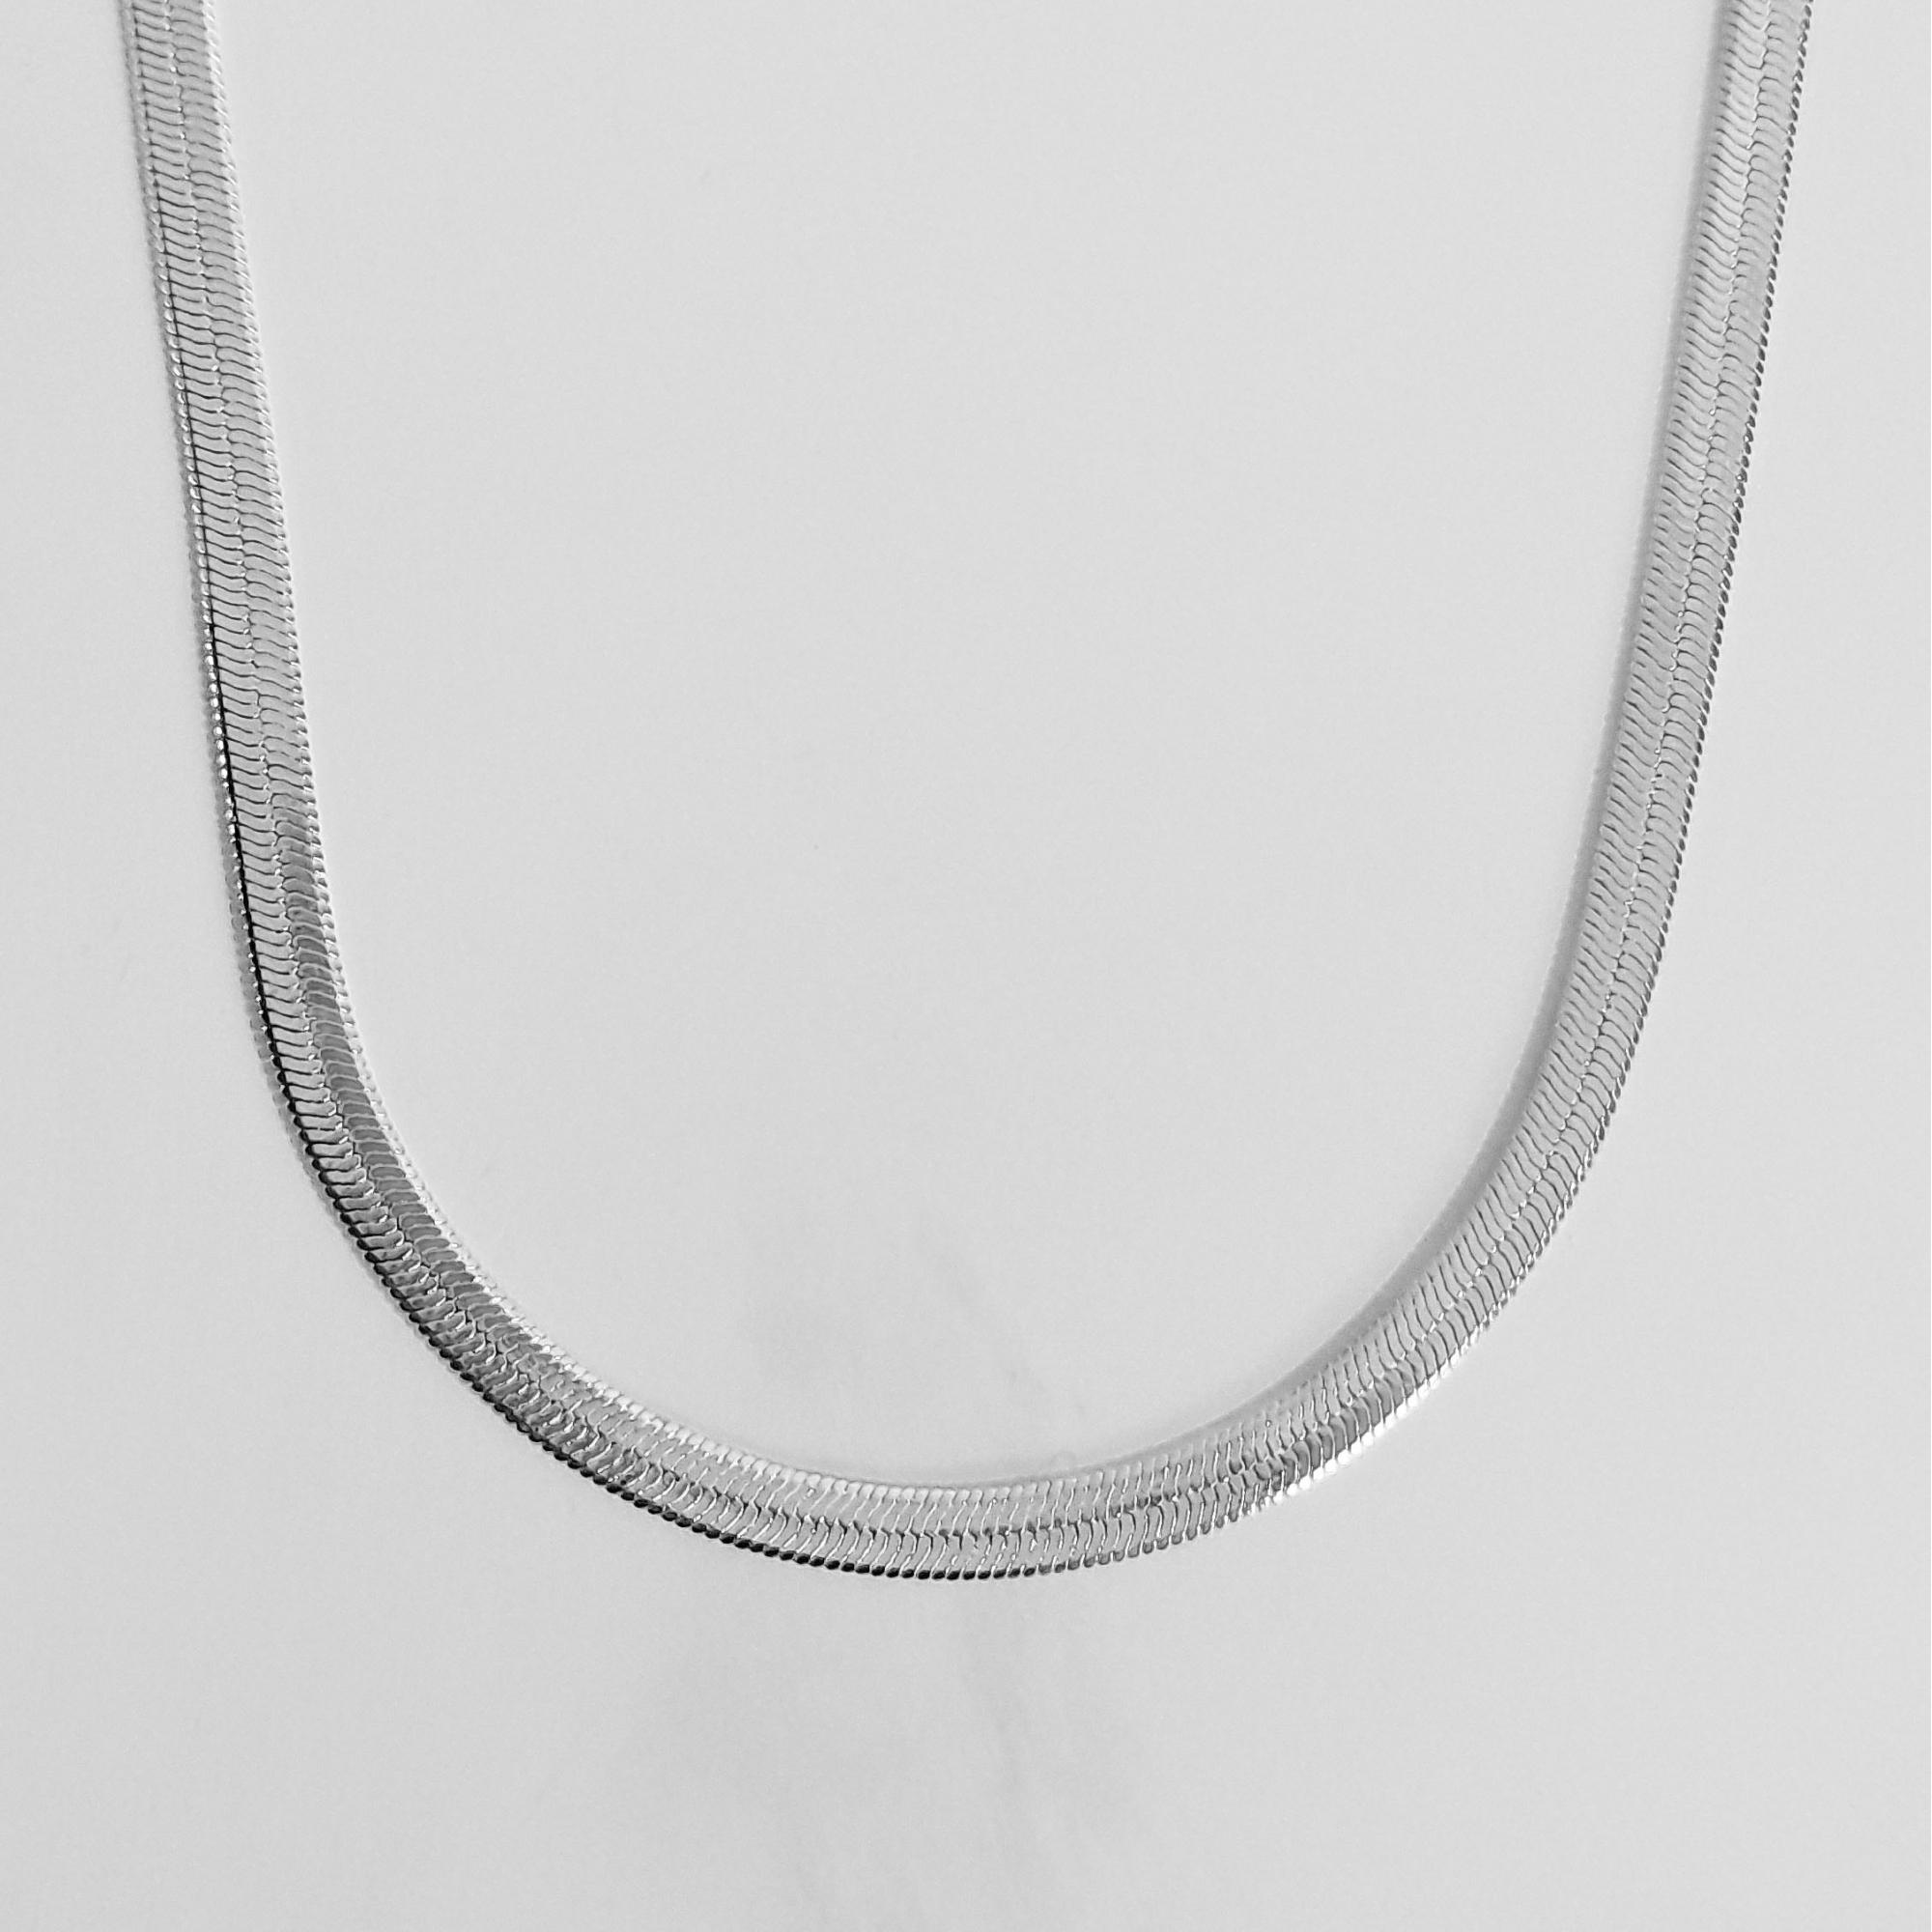 Colar Malha Serpente 3mm 45cm Folheado a Prata 1000  - Lunozê Joias